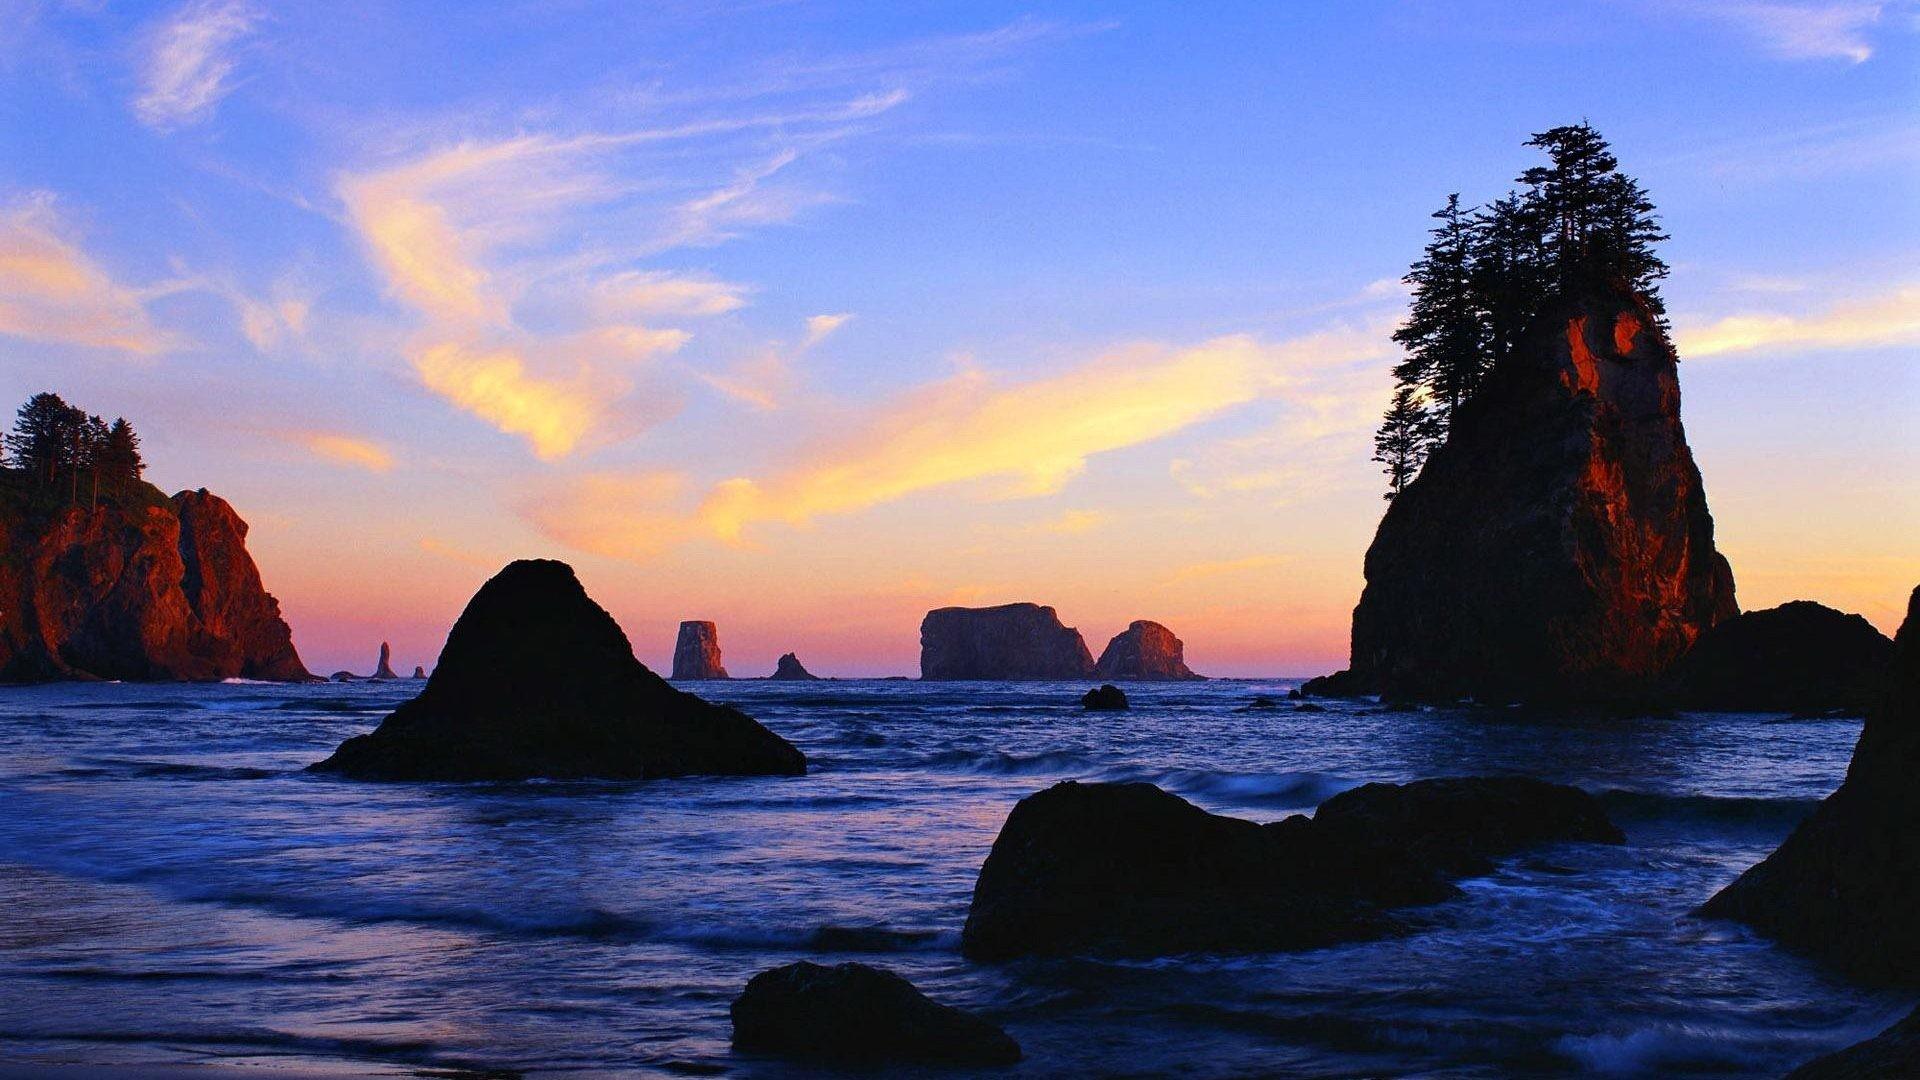 Ocean Tag – Sunrise Lovely Clouds Brach Nice Nature Shore Sea Summer Waves  Coast Pretty Amazing